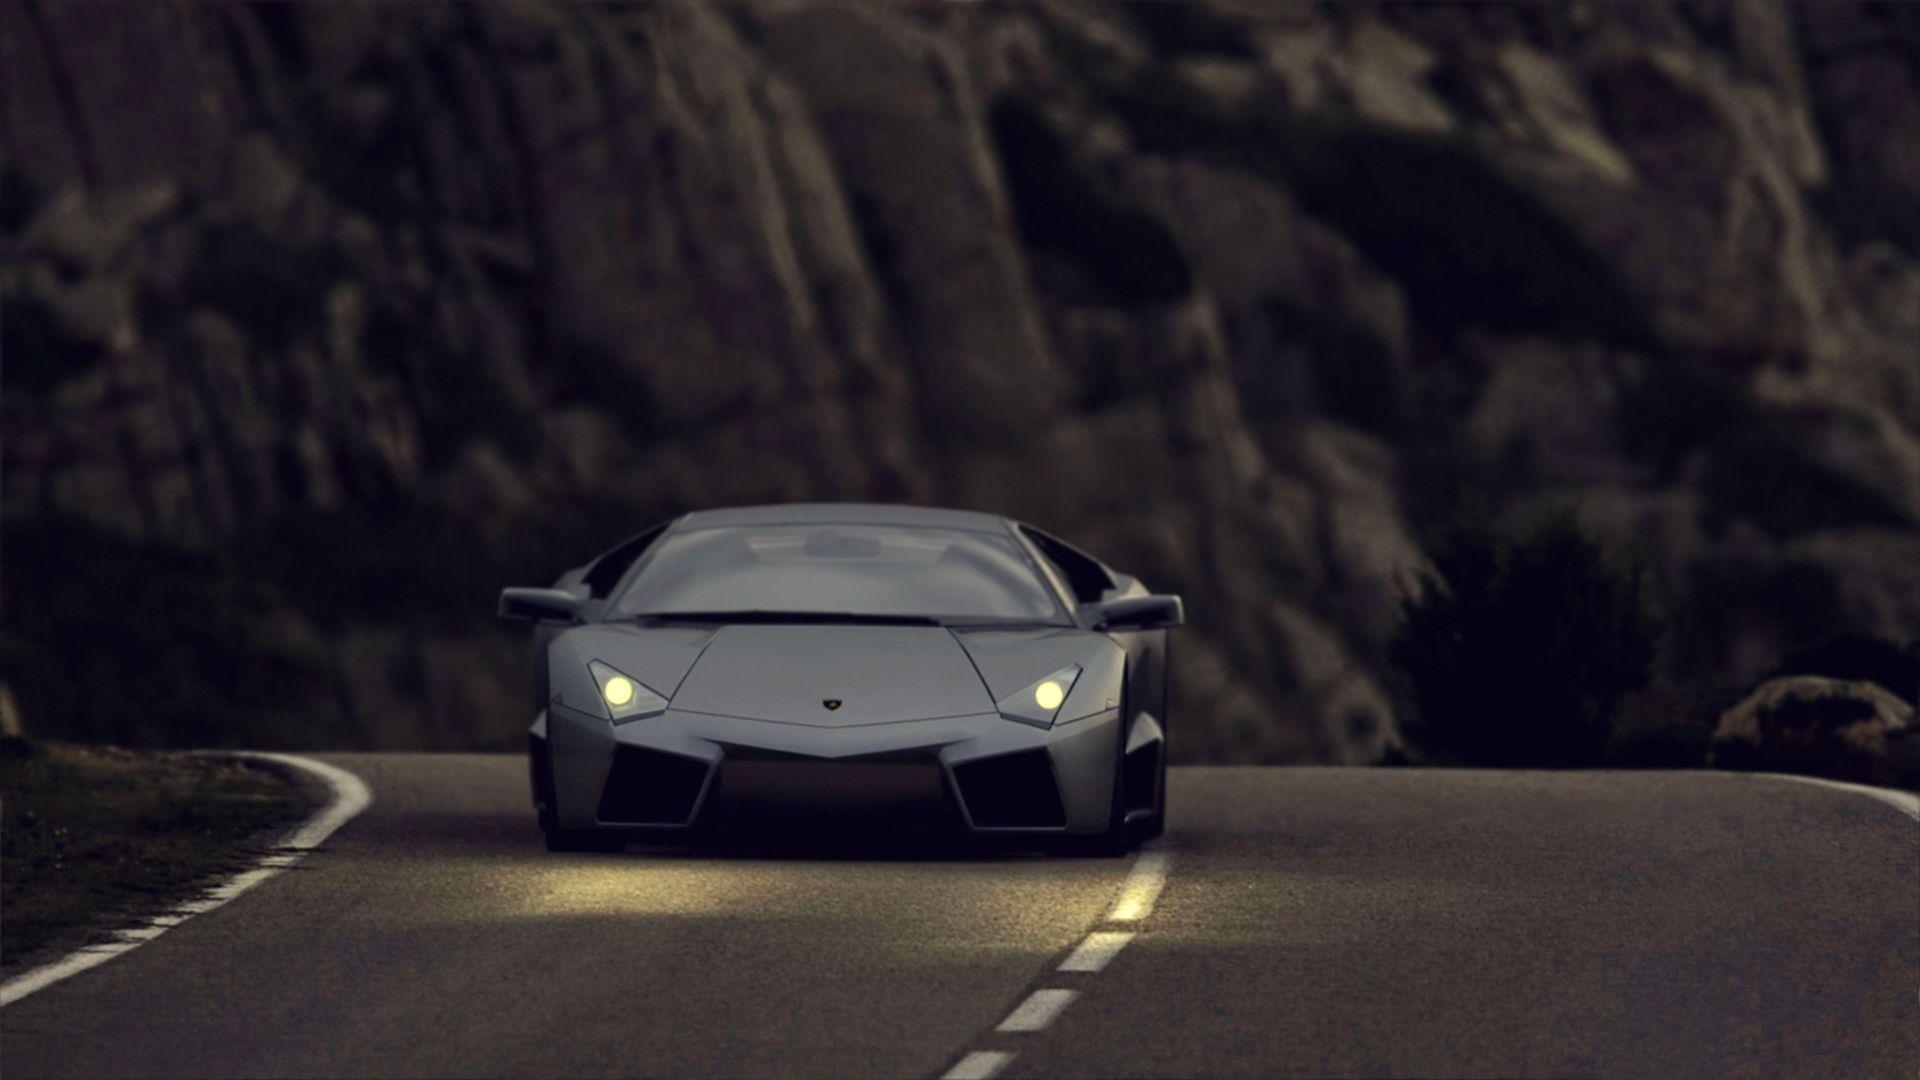 Wallpaper For Pc Lamborghini